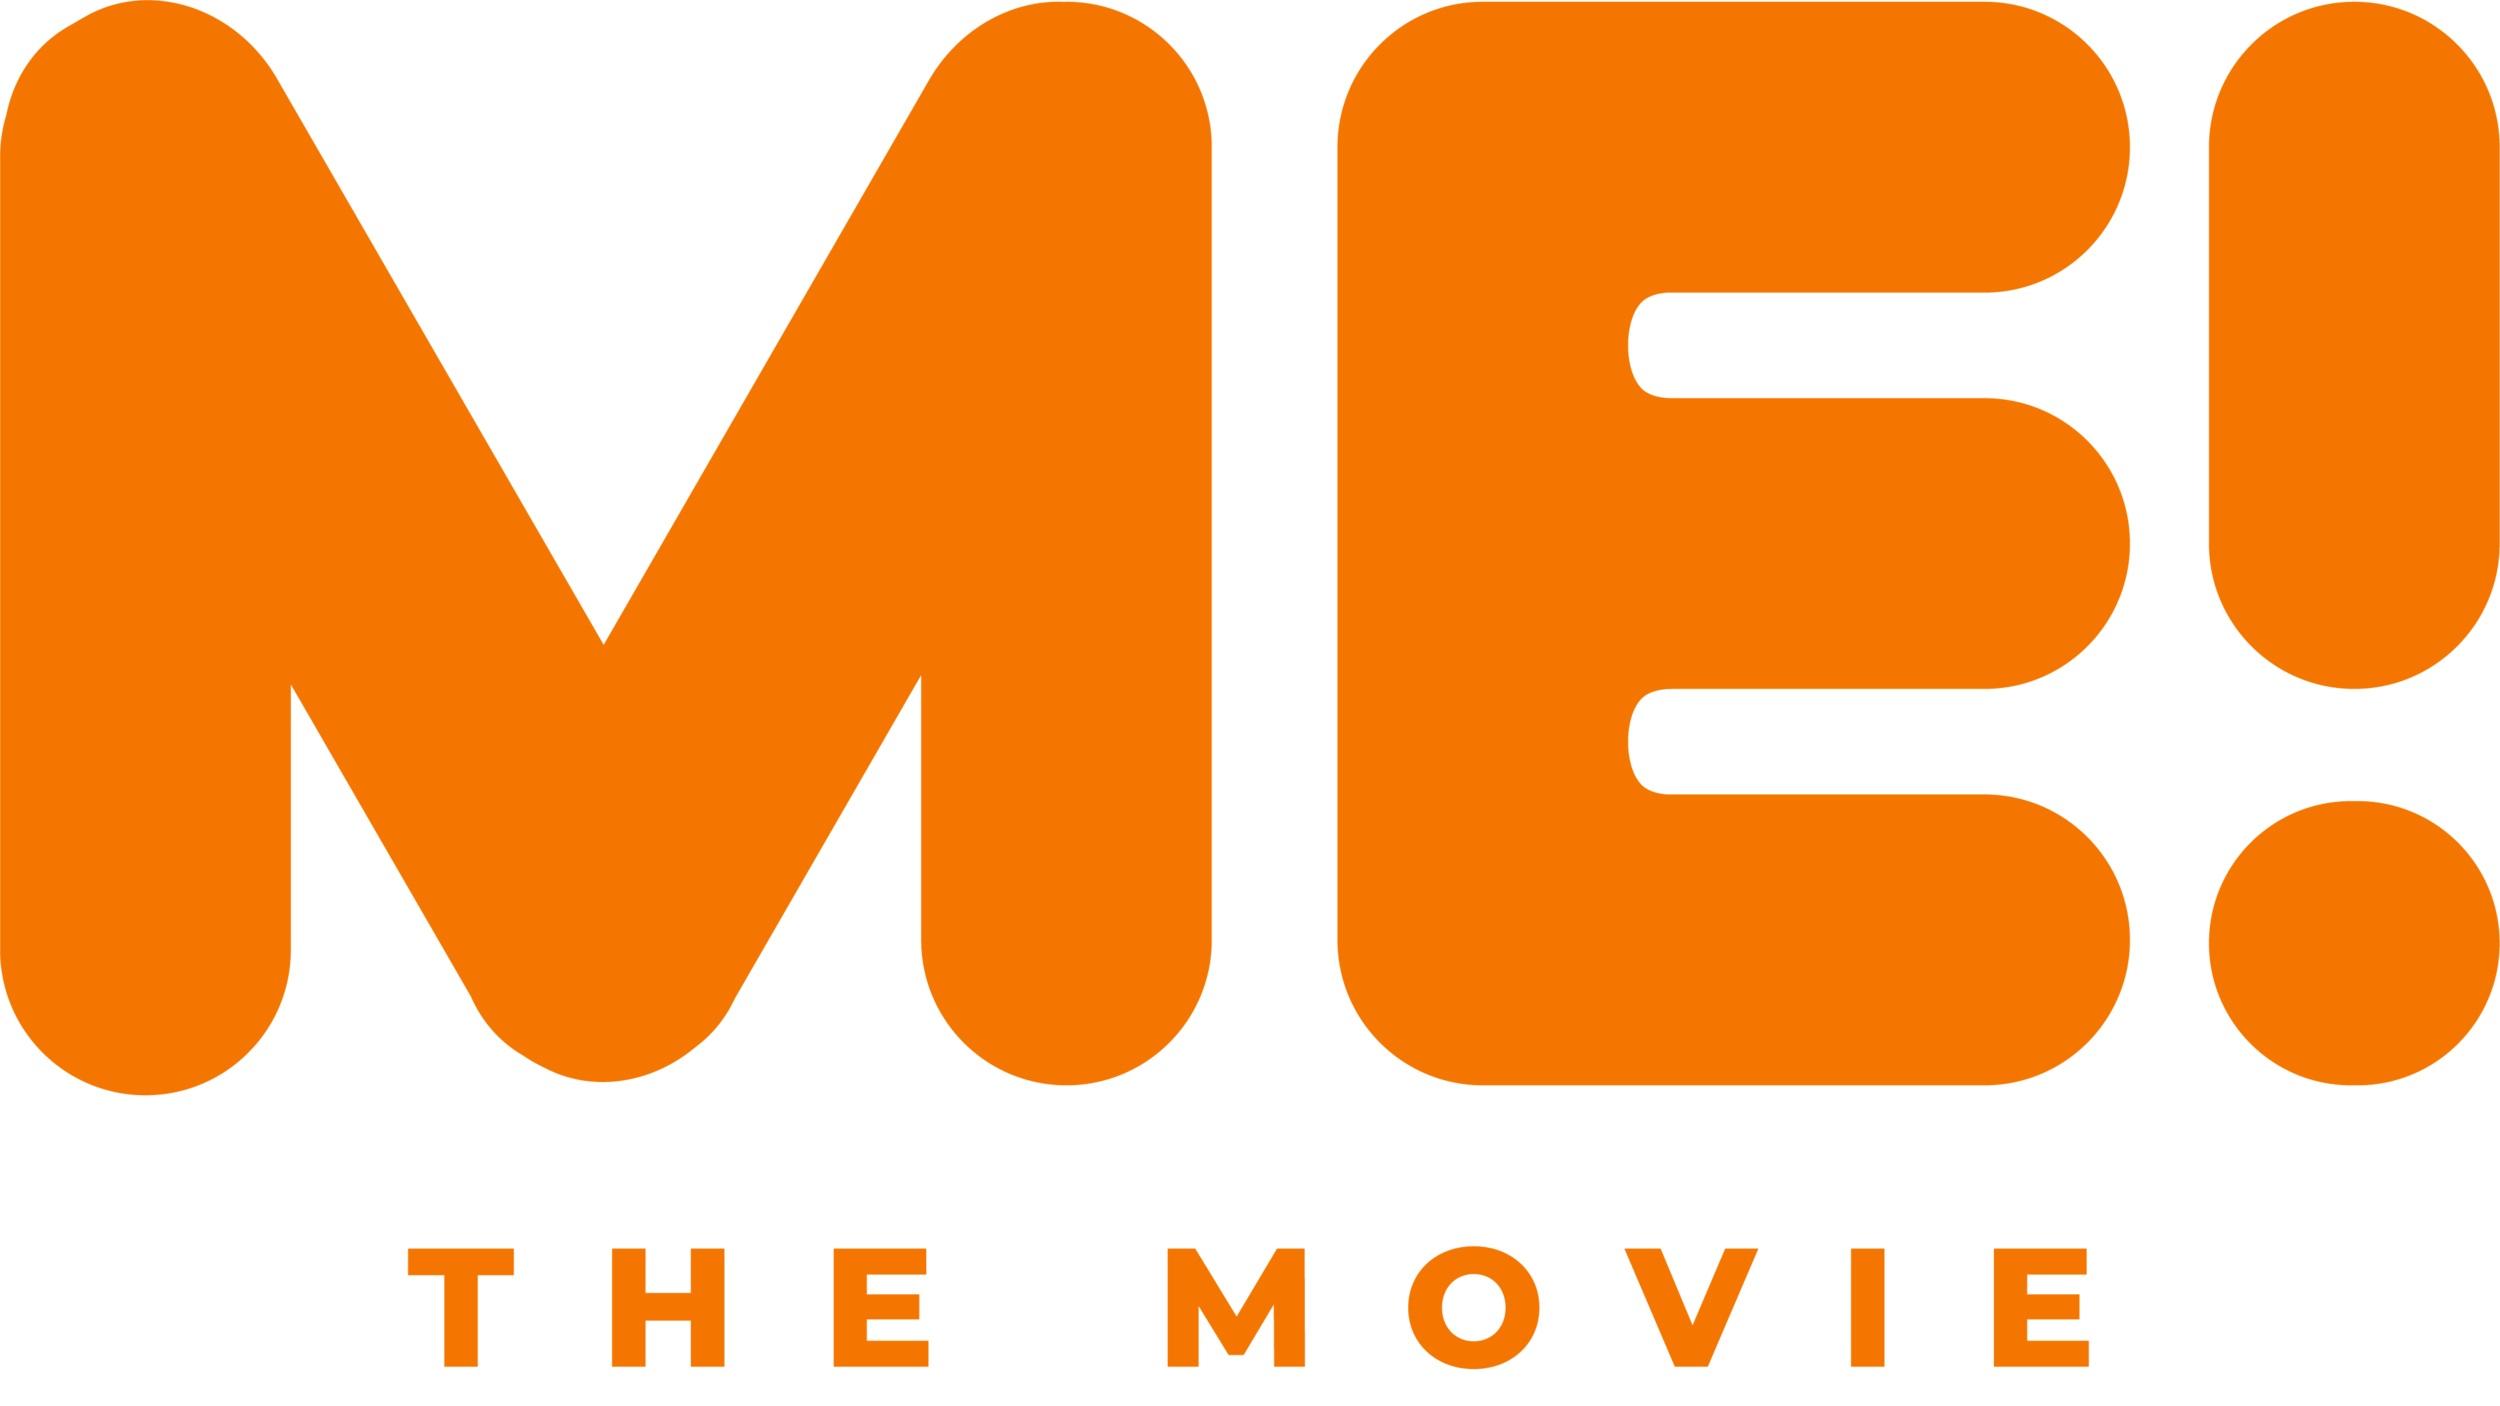 Me_The_Movie_Logo+ORANGE.jpg